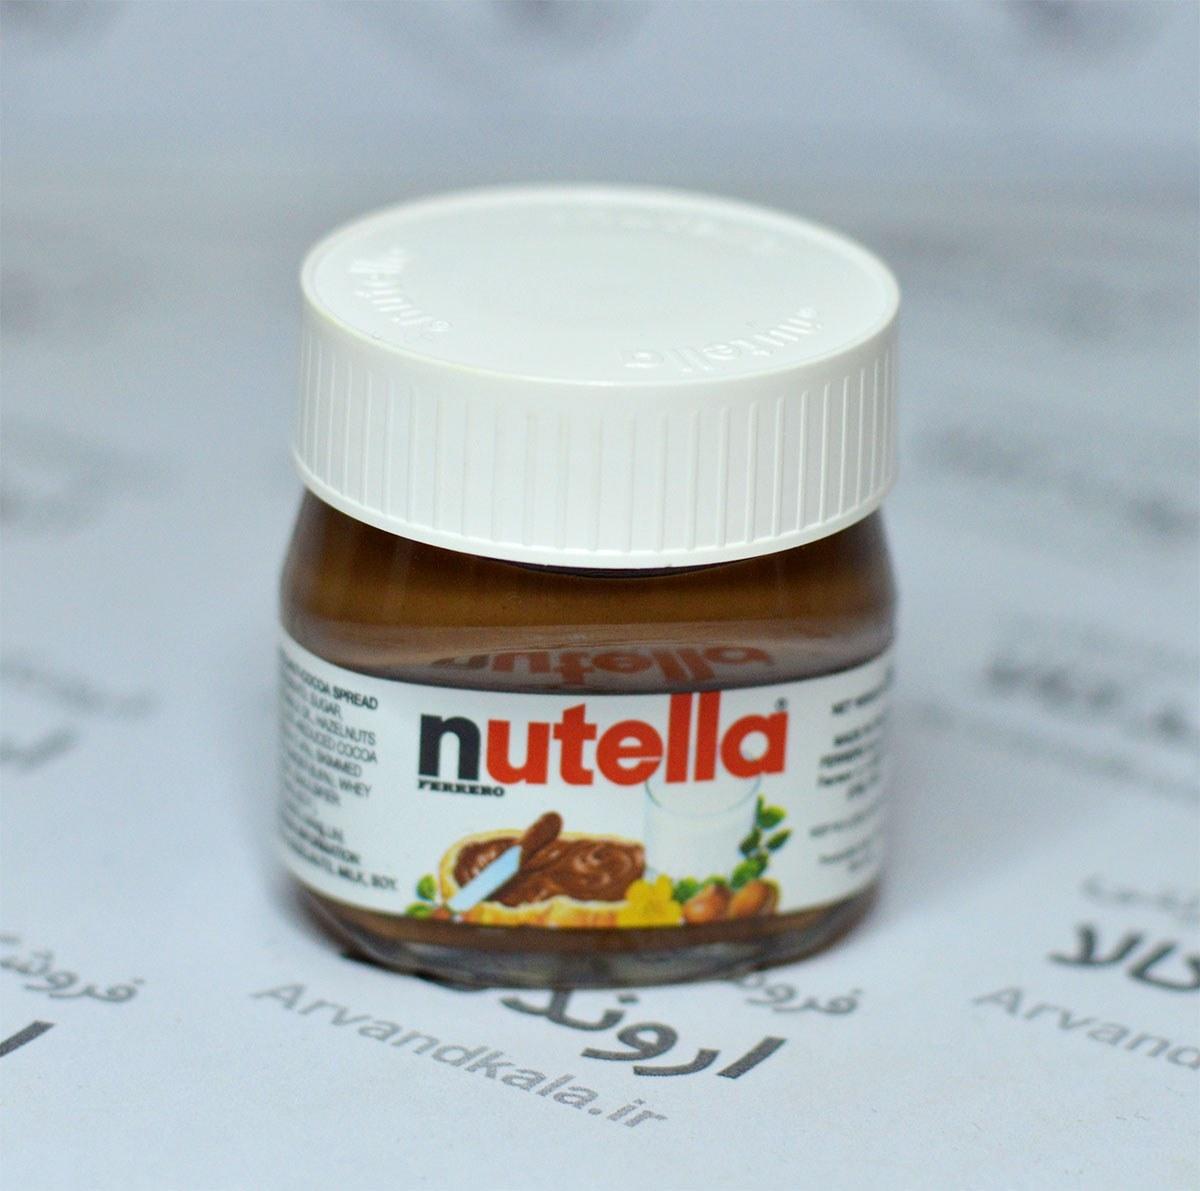 شکلات صبحانه نوتلا ساخت ایتالیا